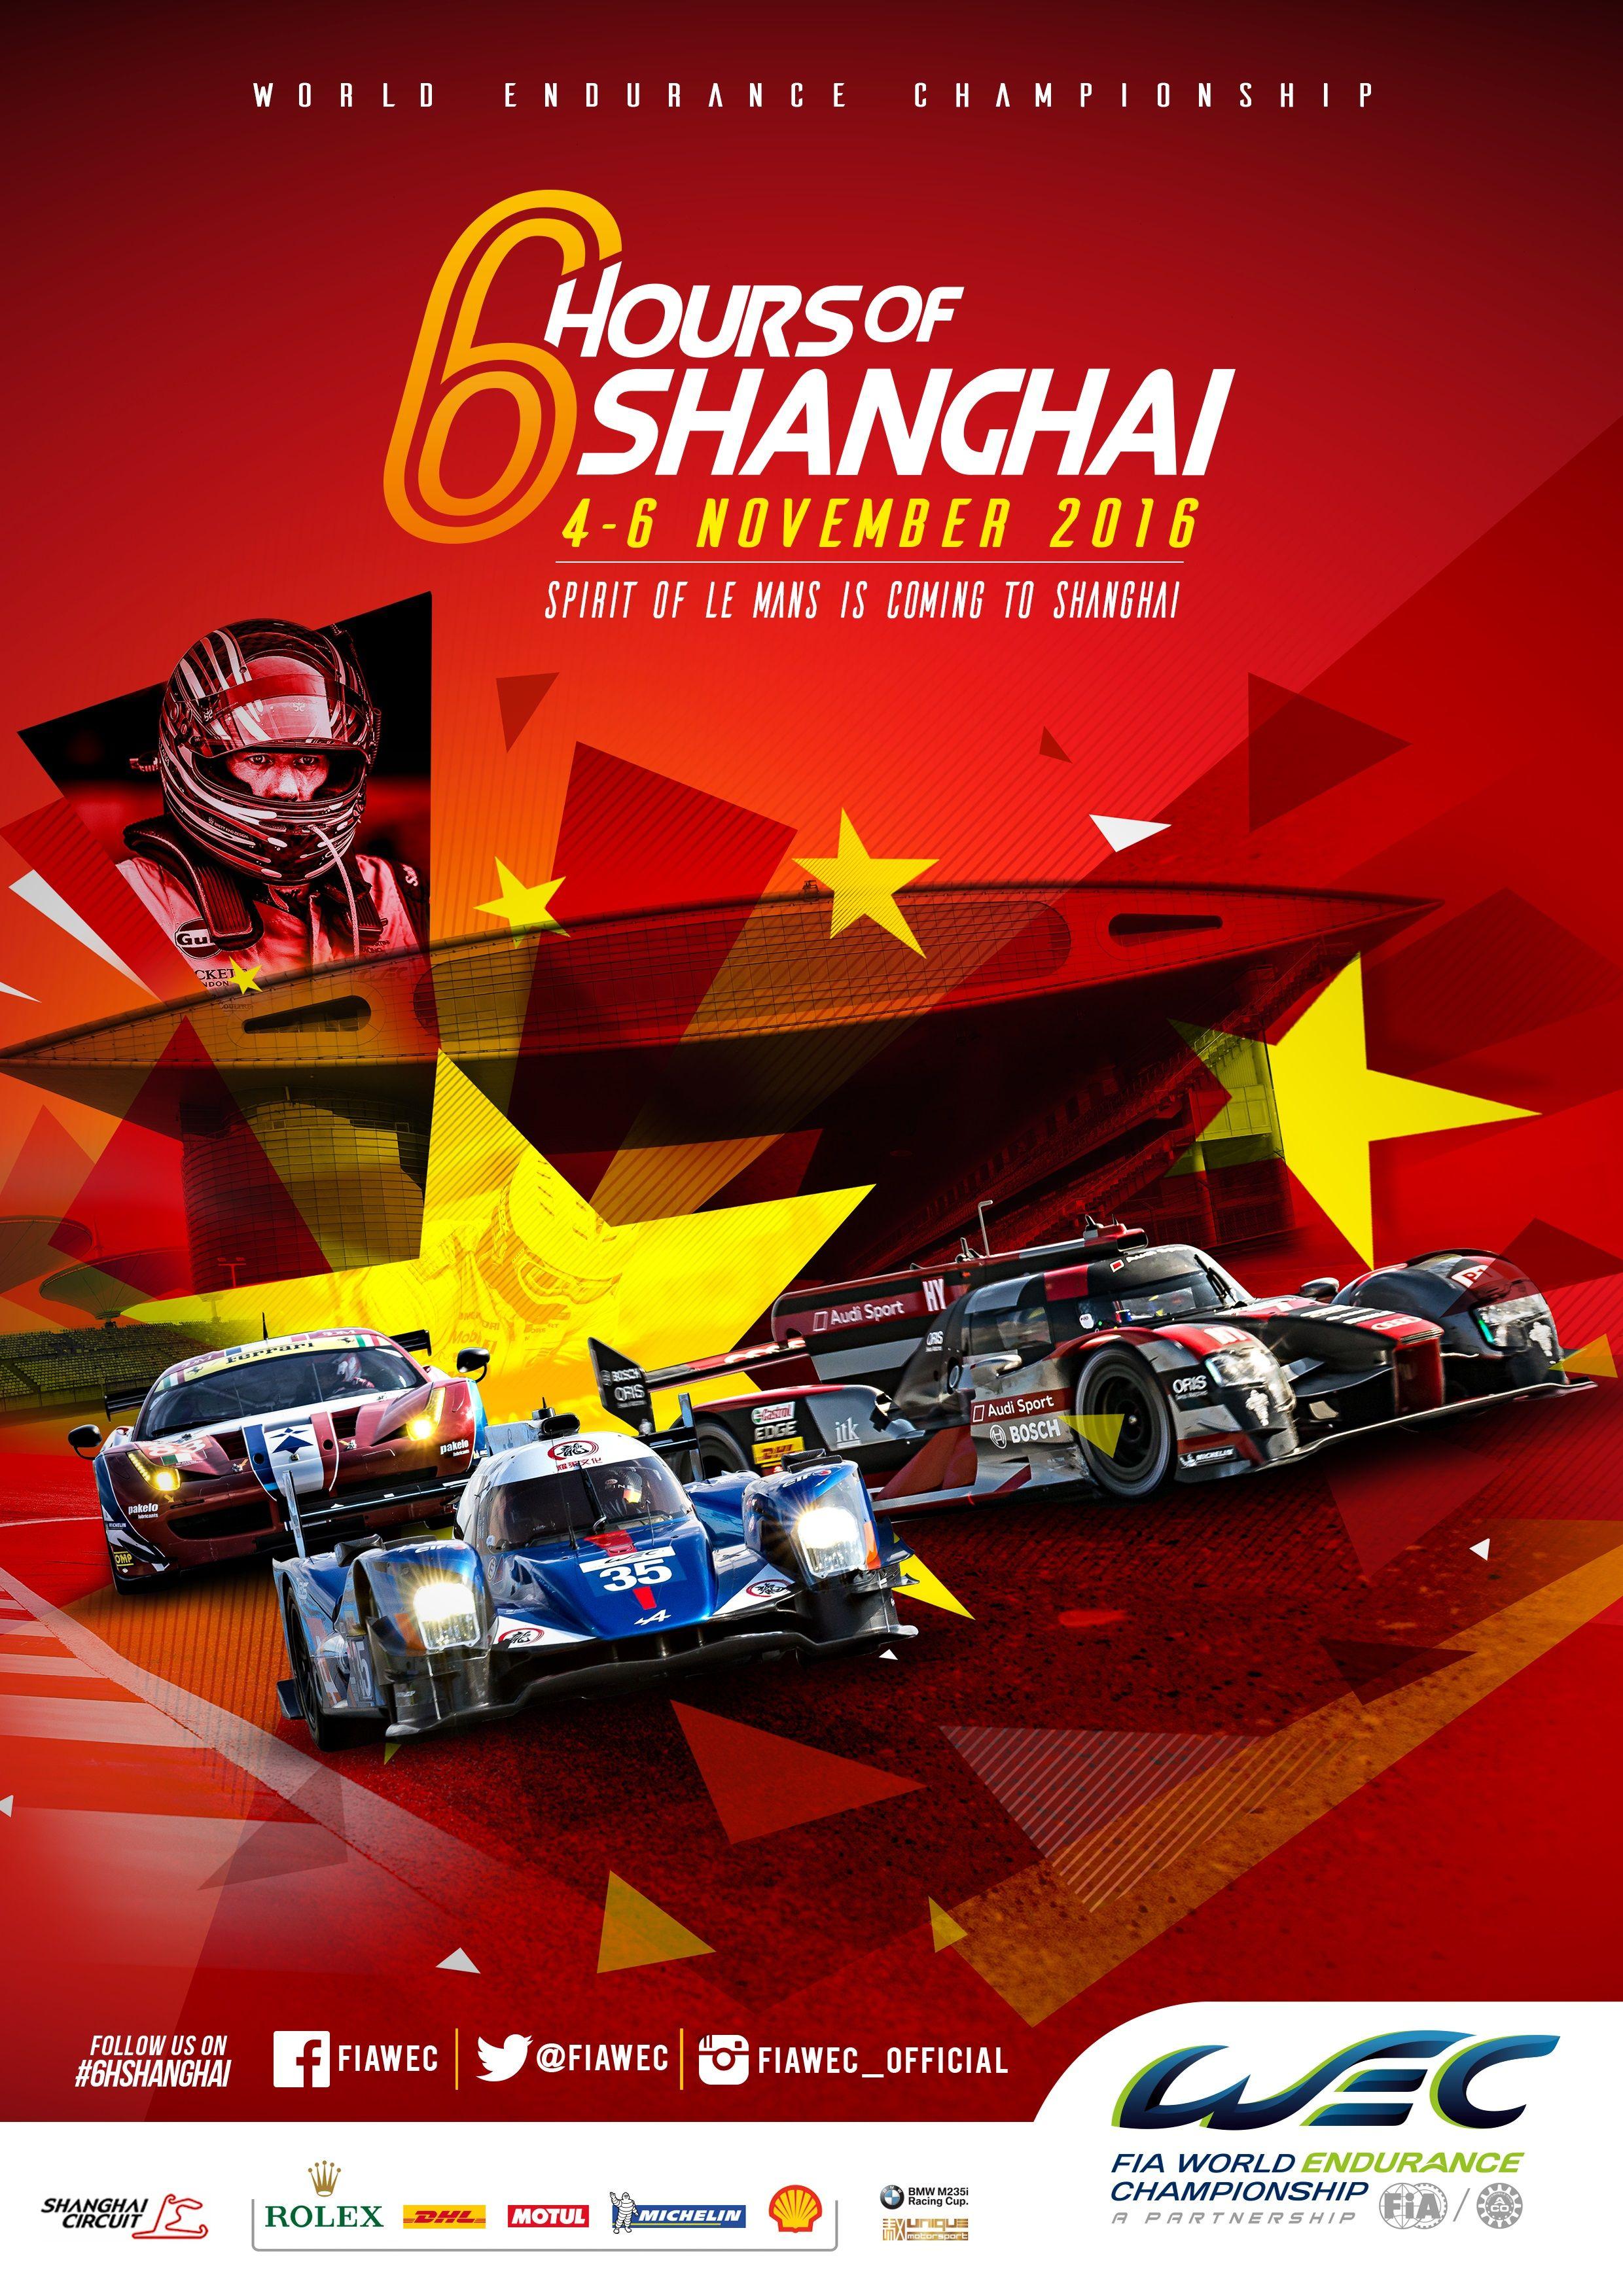 6 Hours Of Shanghai